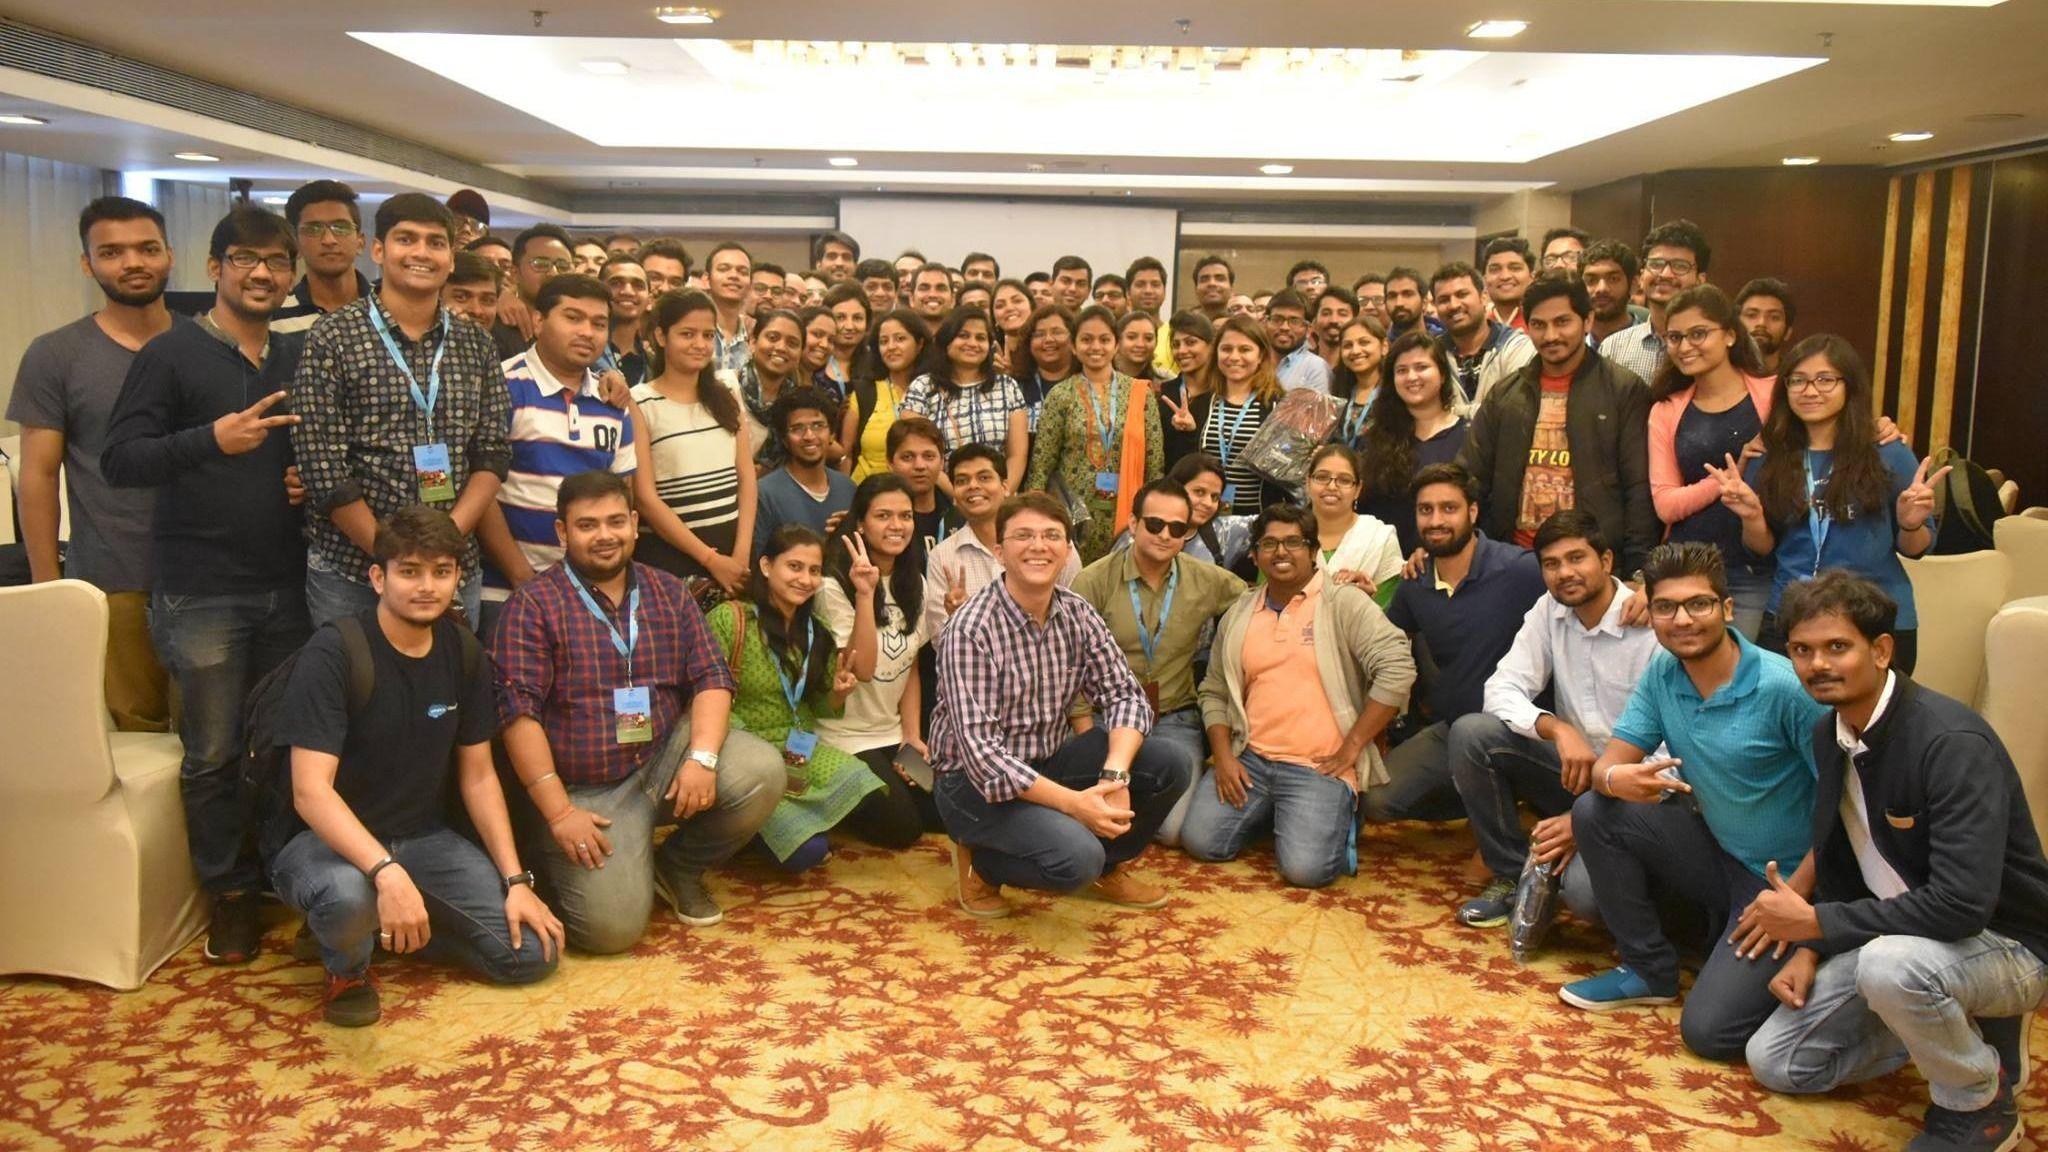 TrailheaDX 2019 Global Gathering | Meetup